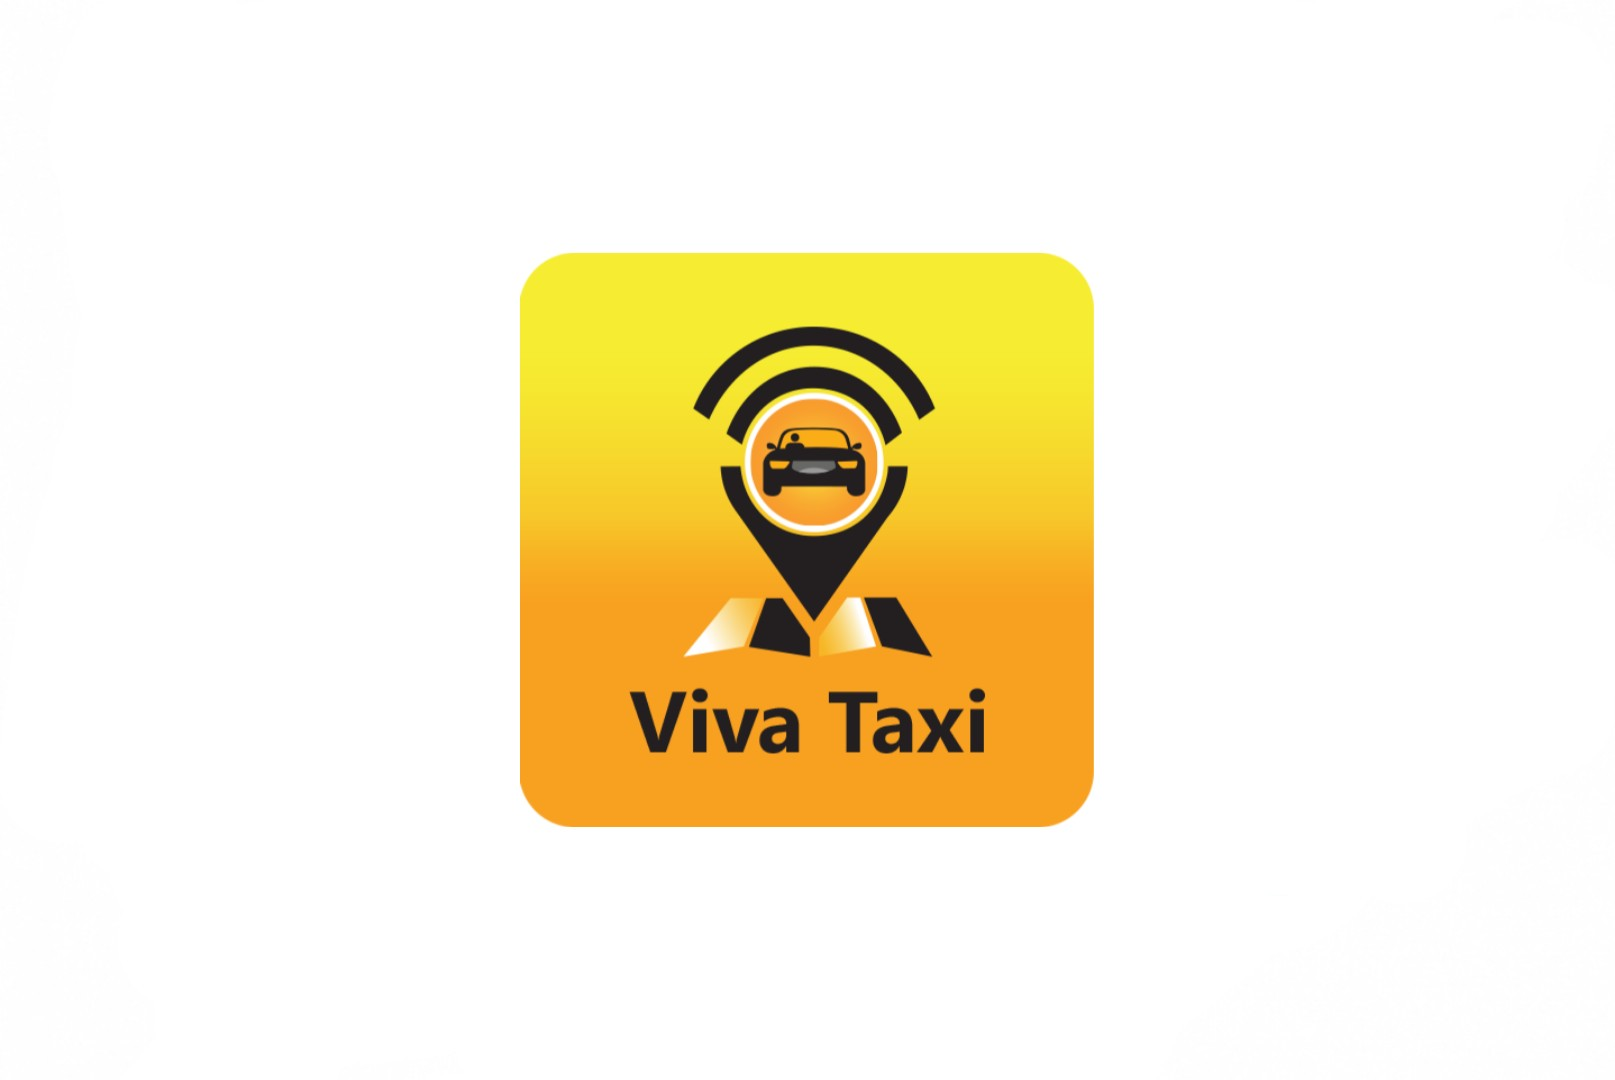 Sovagasmoz - Emprego na empresa Viva Táxi Moçambique